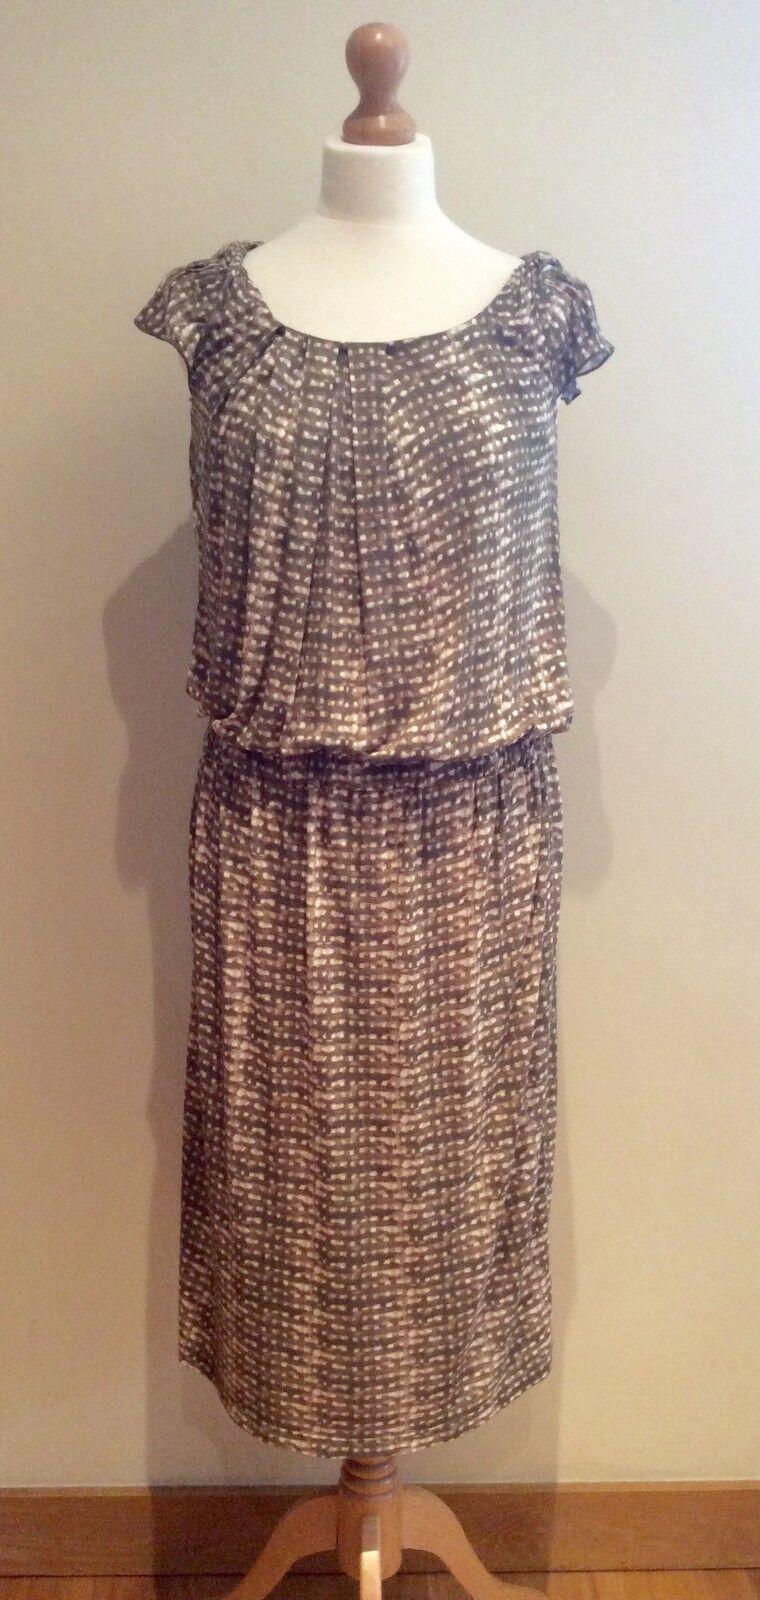 MAX MARA WEEKEND DRESS Größe L KHAKI Grün Weiß STRETCH